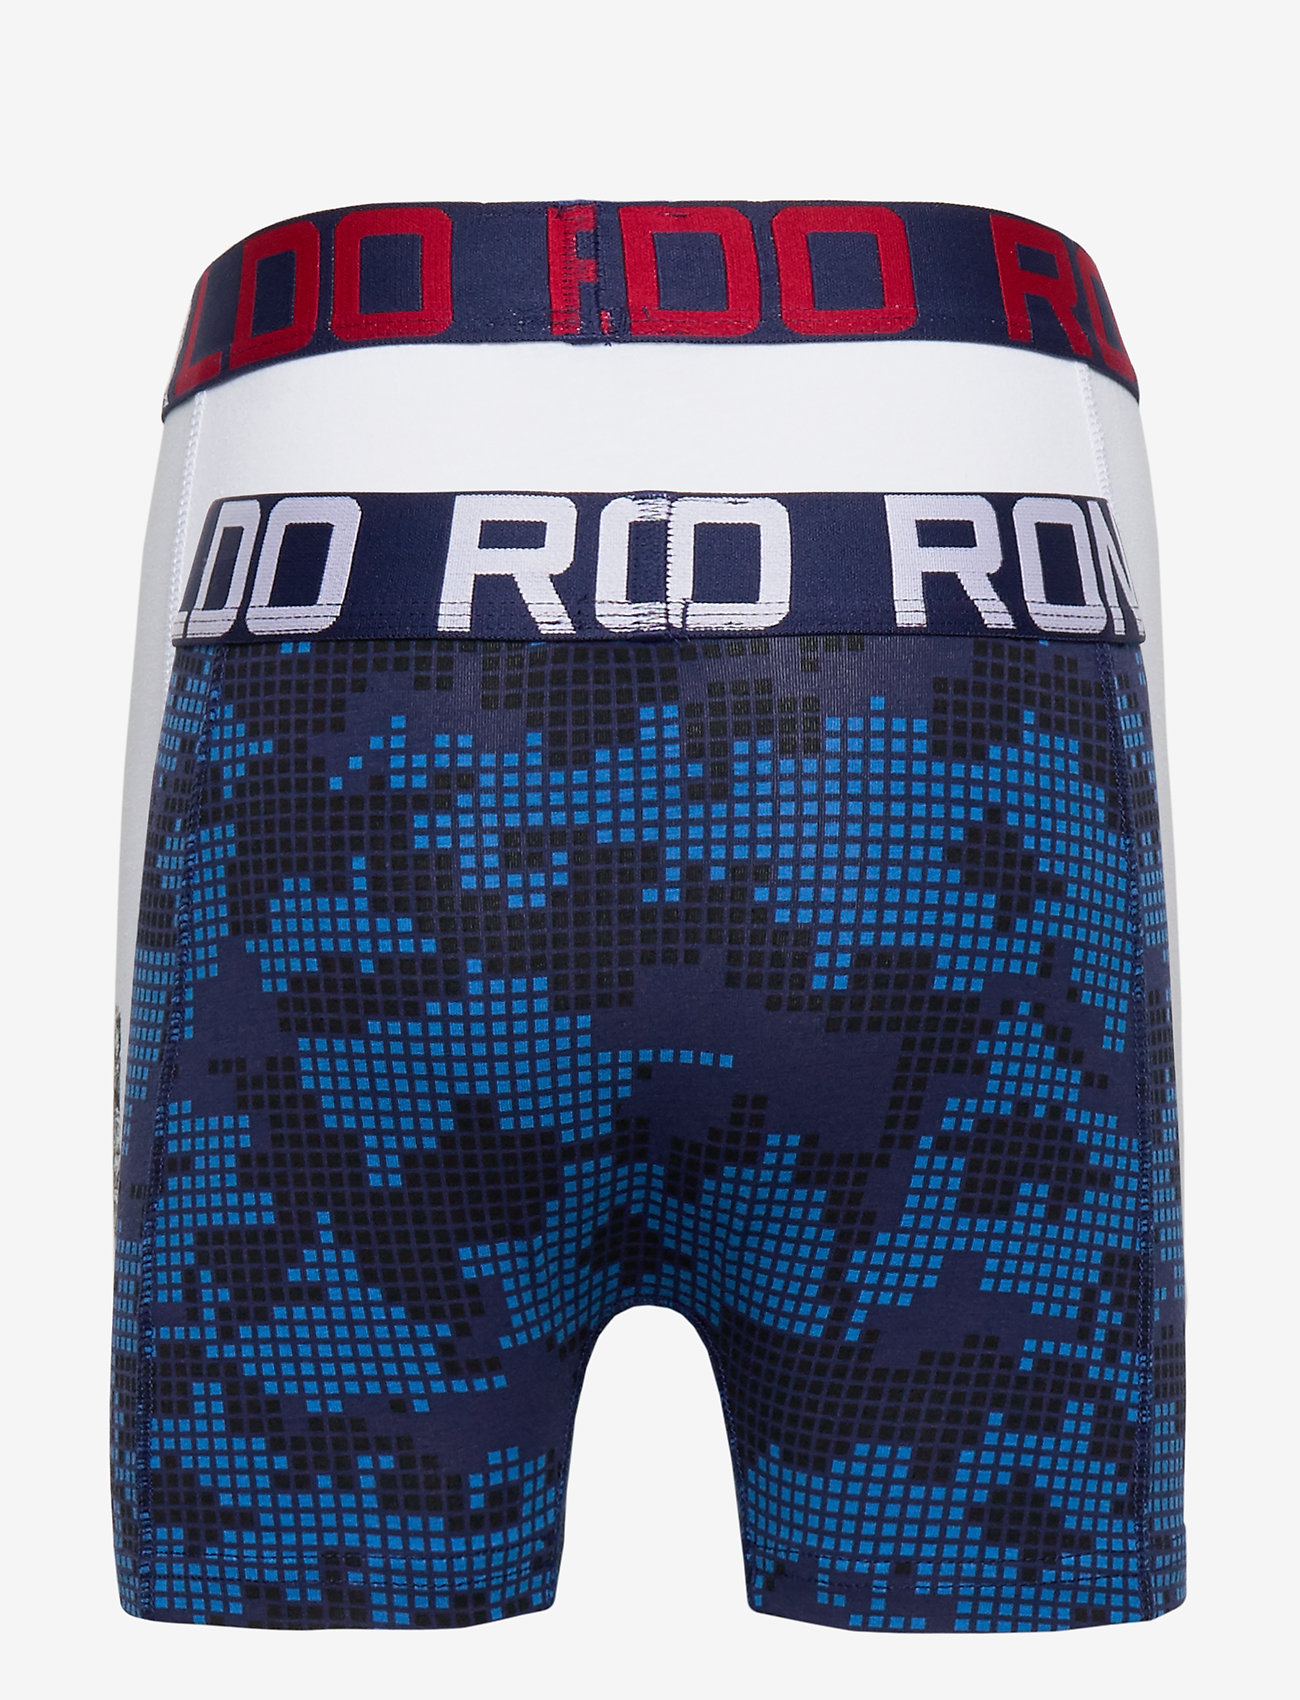 CR7 - CR7 Boy's Trunk 2-pack - shorts et pantalons - multi - 1